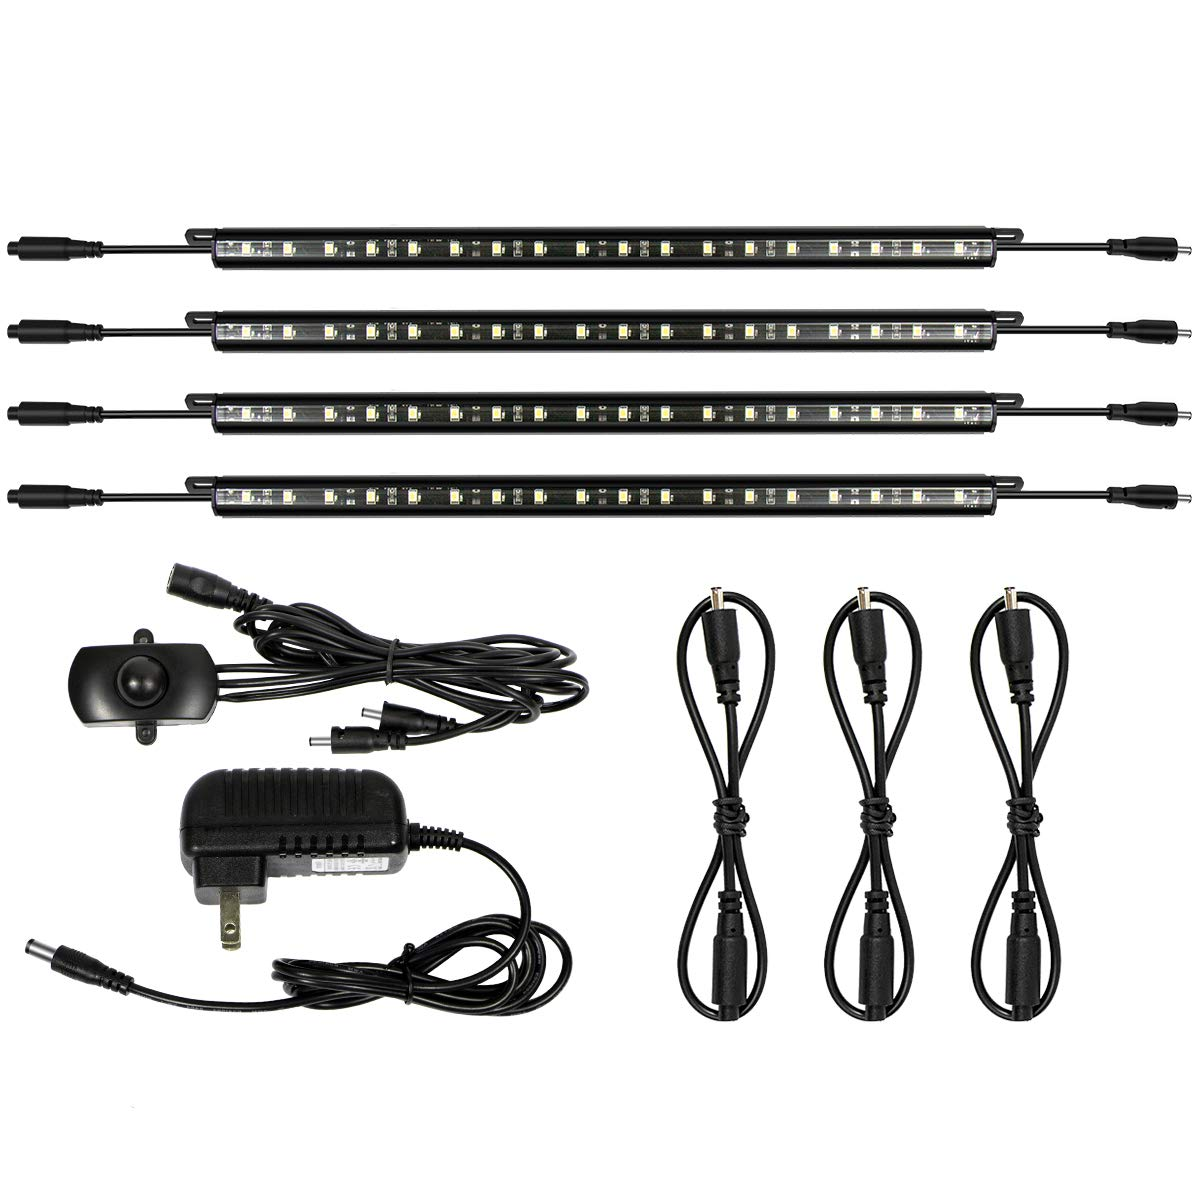 Mingdak LED Safe Lighting Kit - Linkable Motion Sensor Activated LED Light Bars for Under Cabinet, Gun Safe, Locker, Closet, Under Counter, Shelf, Showcase,5000K Daylight,4-Pack …